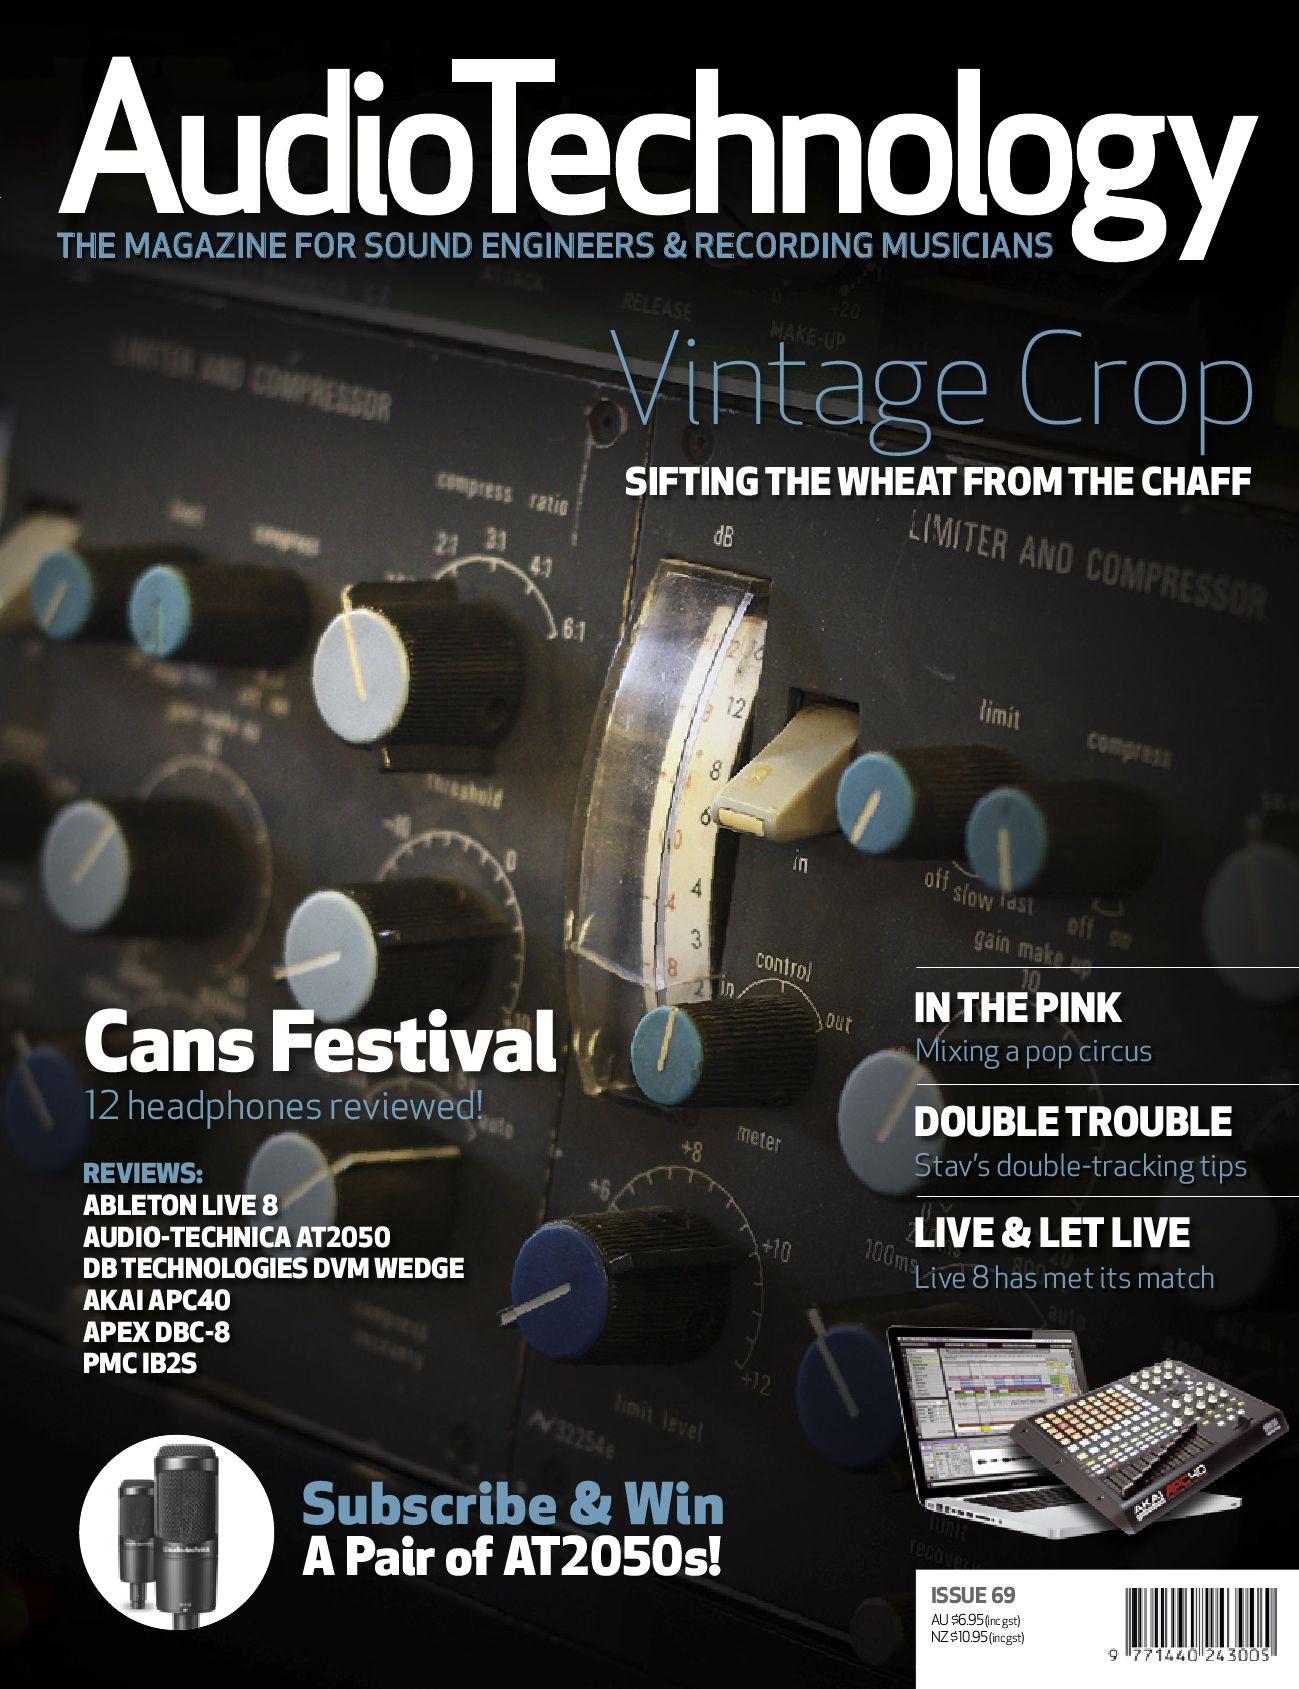 Audio Technology - Issue 69 August 2009 by Alchemedia Publishing - issuu